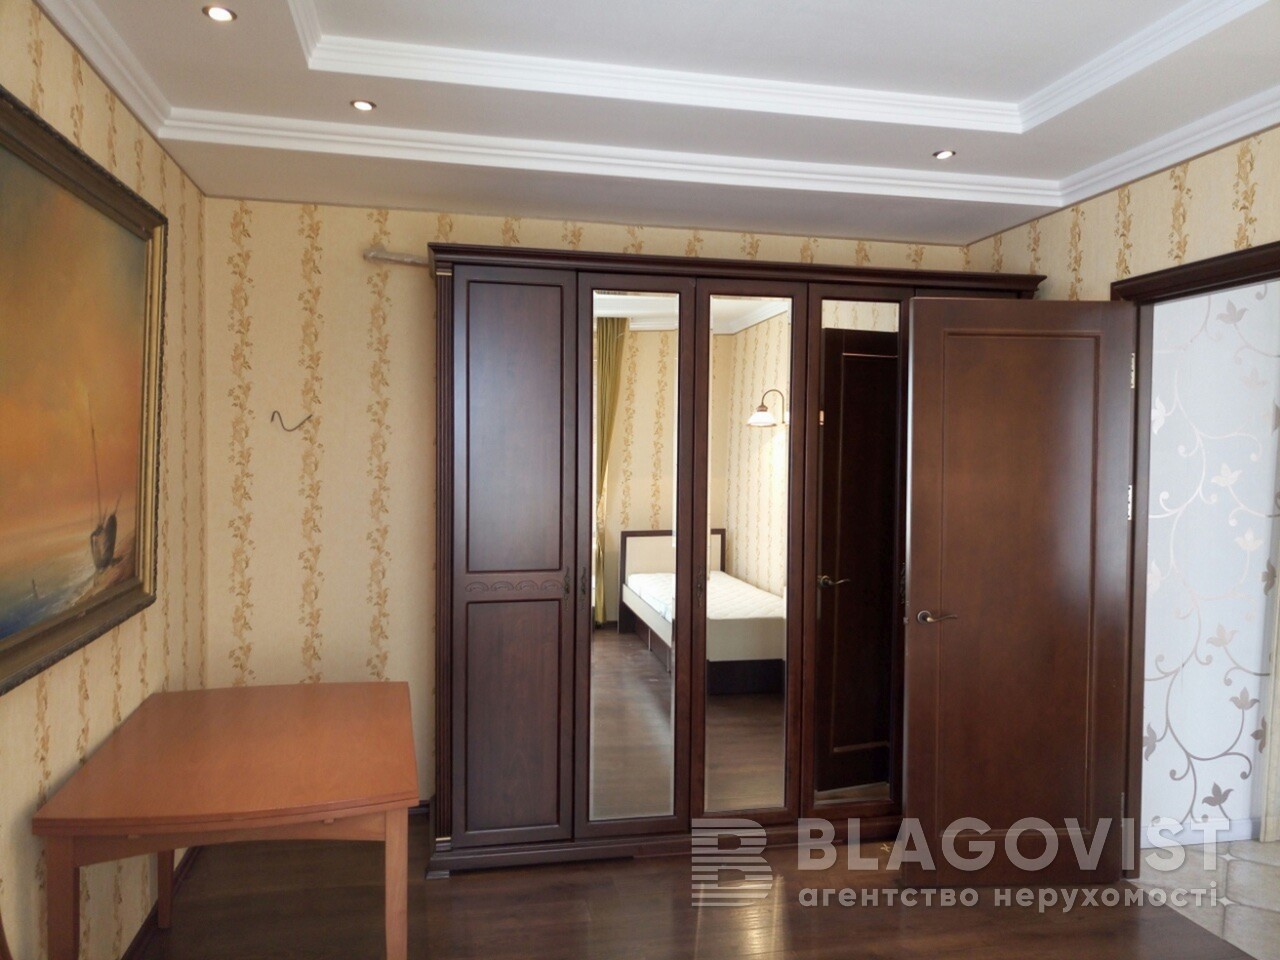 Квартира C-90891, Львовская, 22а, Киев - Фото 11